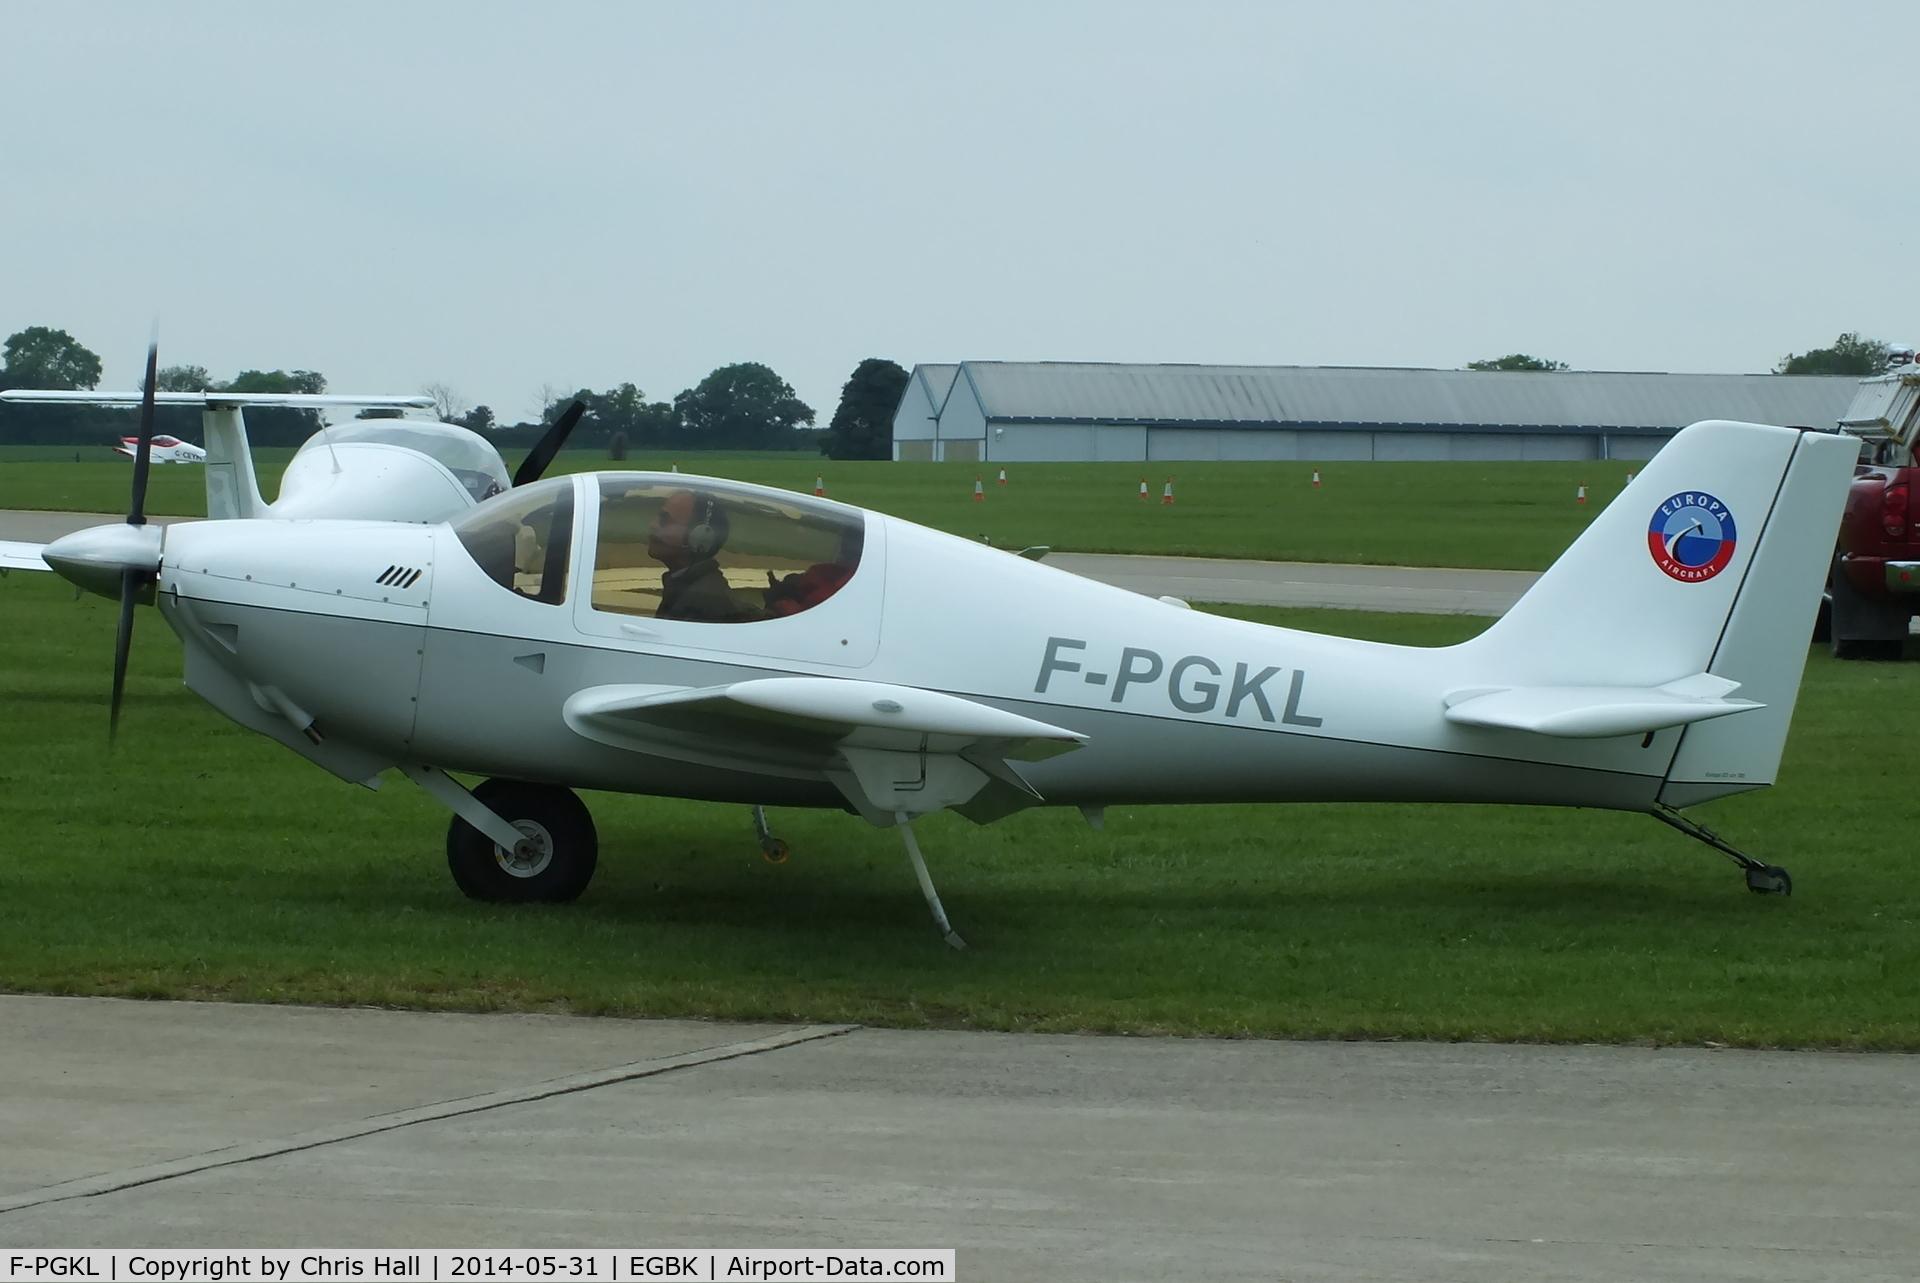 F-PGKL, Europa XS Monowheel C/N 395, at AeroExpo 2014